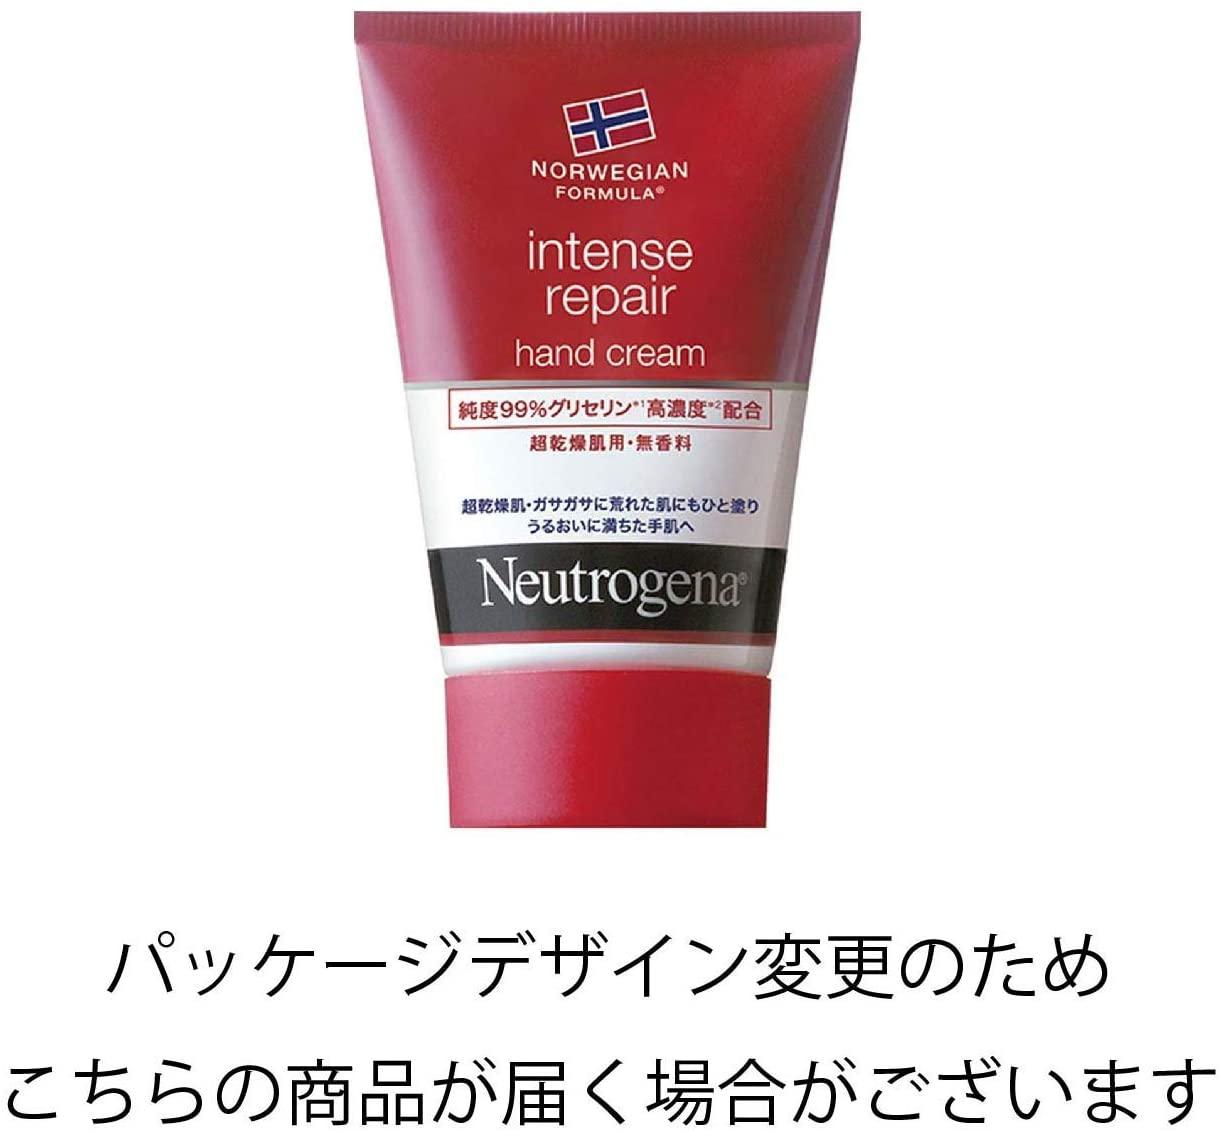 Neutrogena(ニュートロジーナ) インテンスリペア ハンドクリームの商品画像3